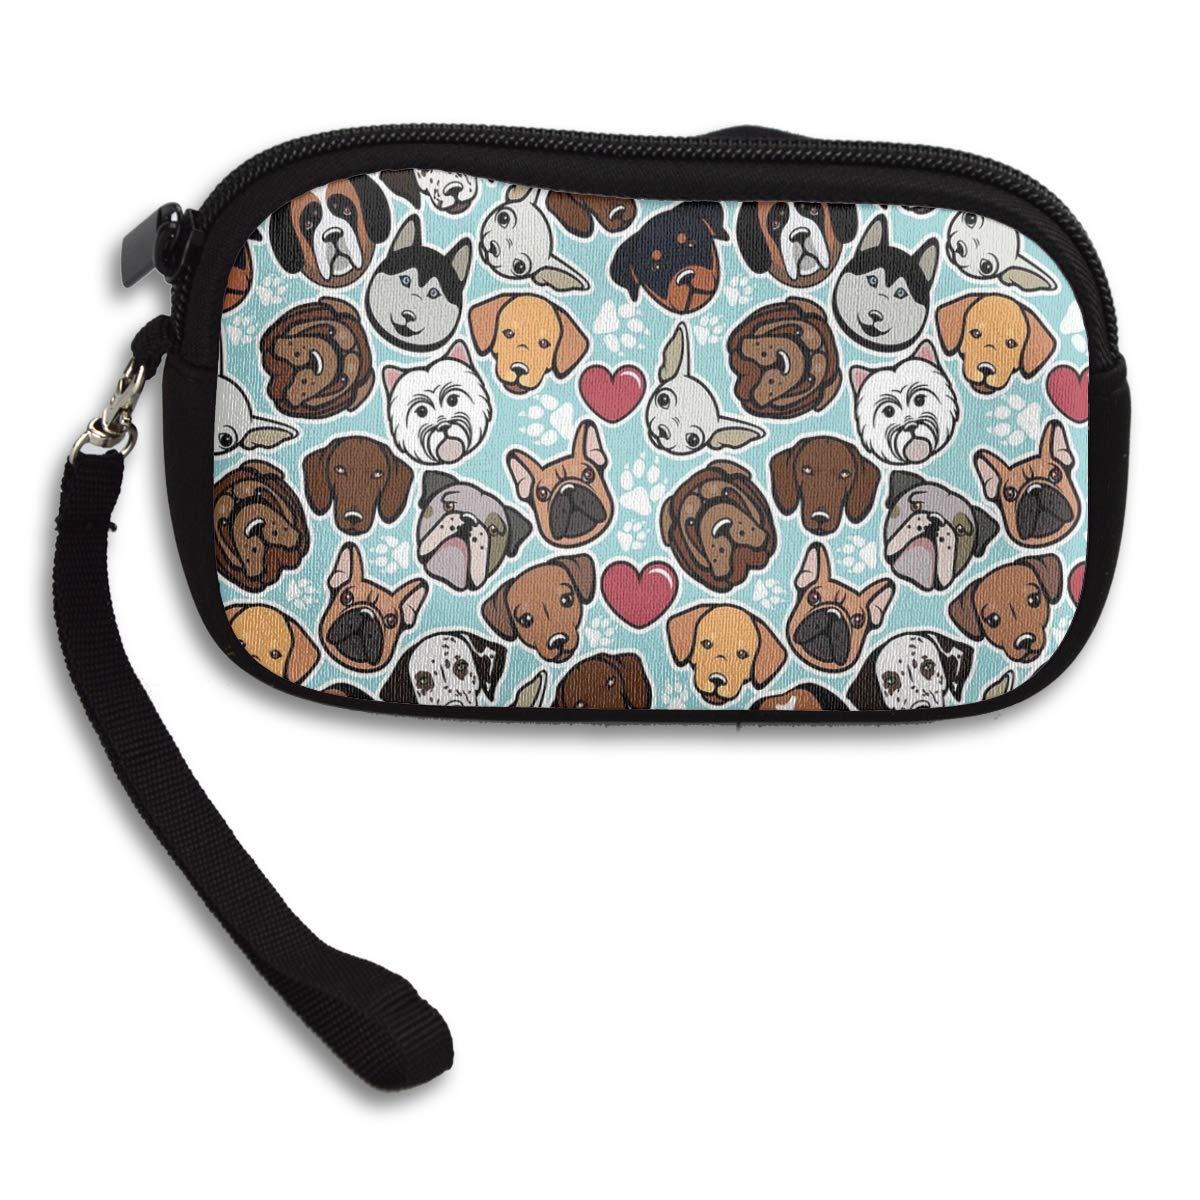 Dog Paw Prints Heart Canine Breeds Coin Pouch Clutch Purse Wristlet Wallet Phone Card Holder Handbag